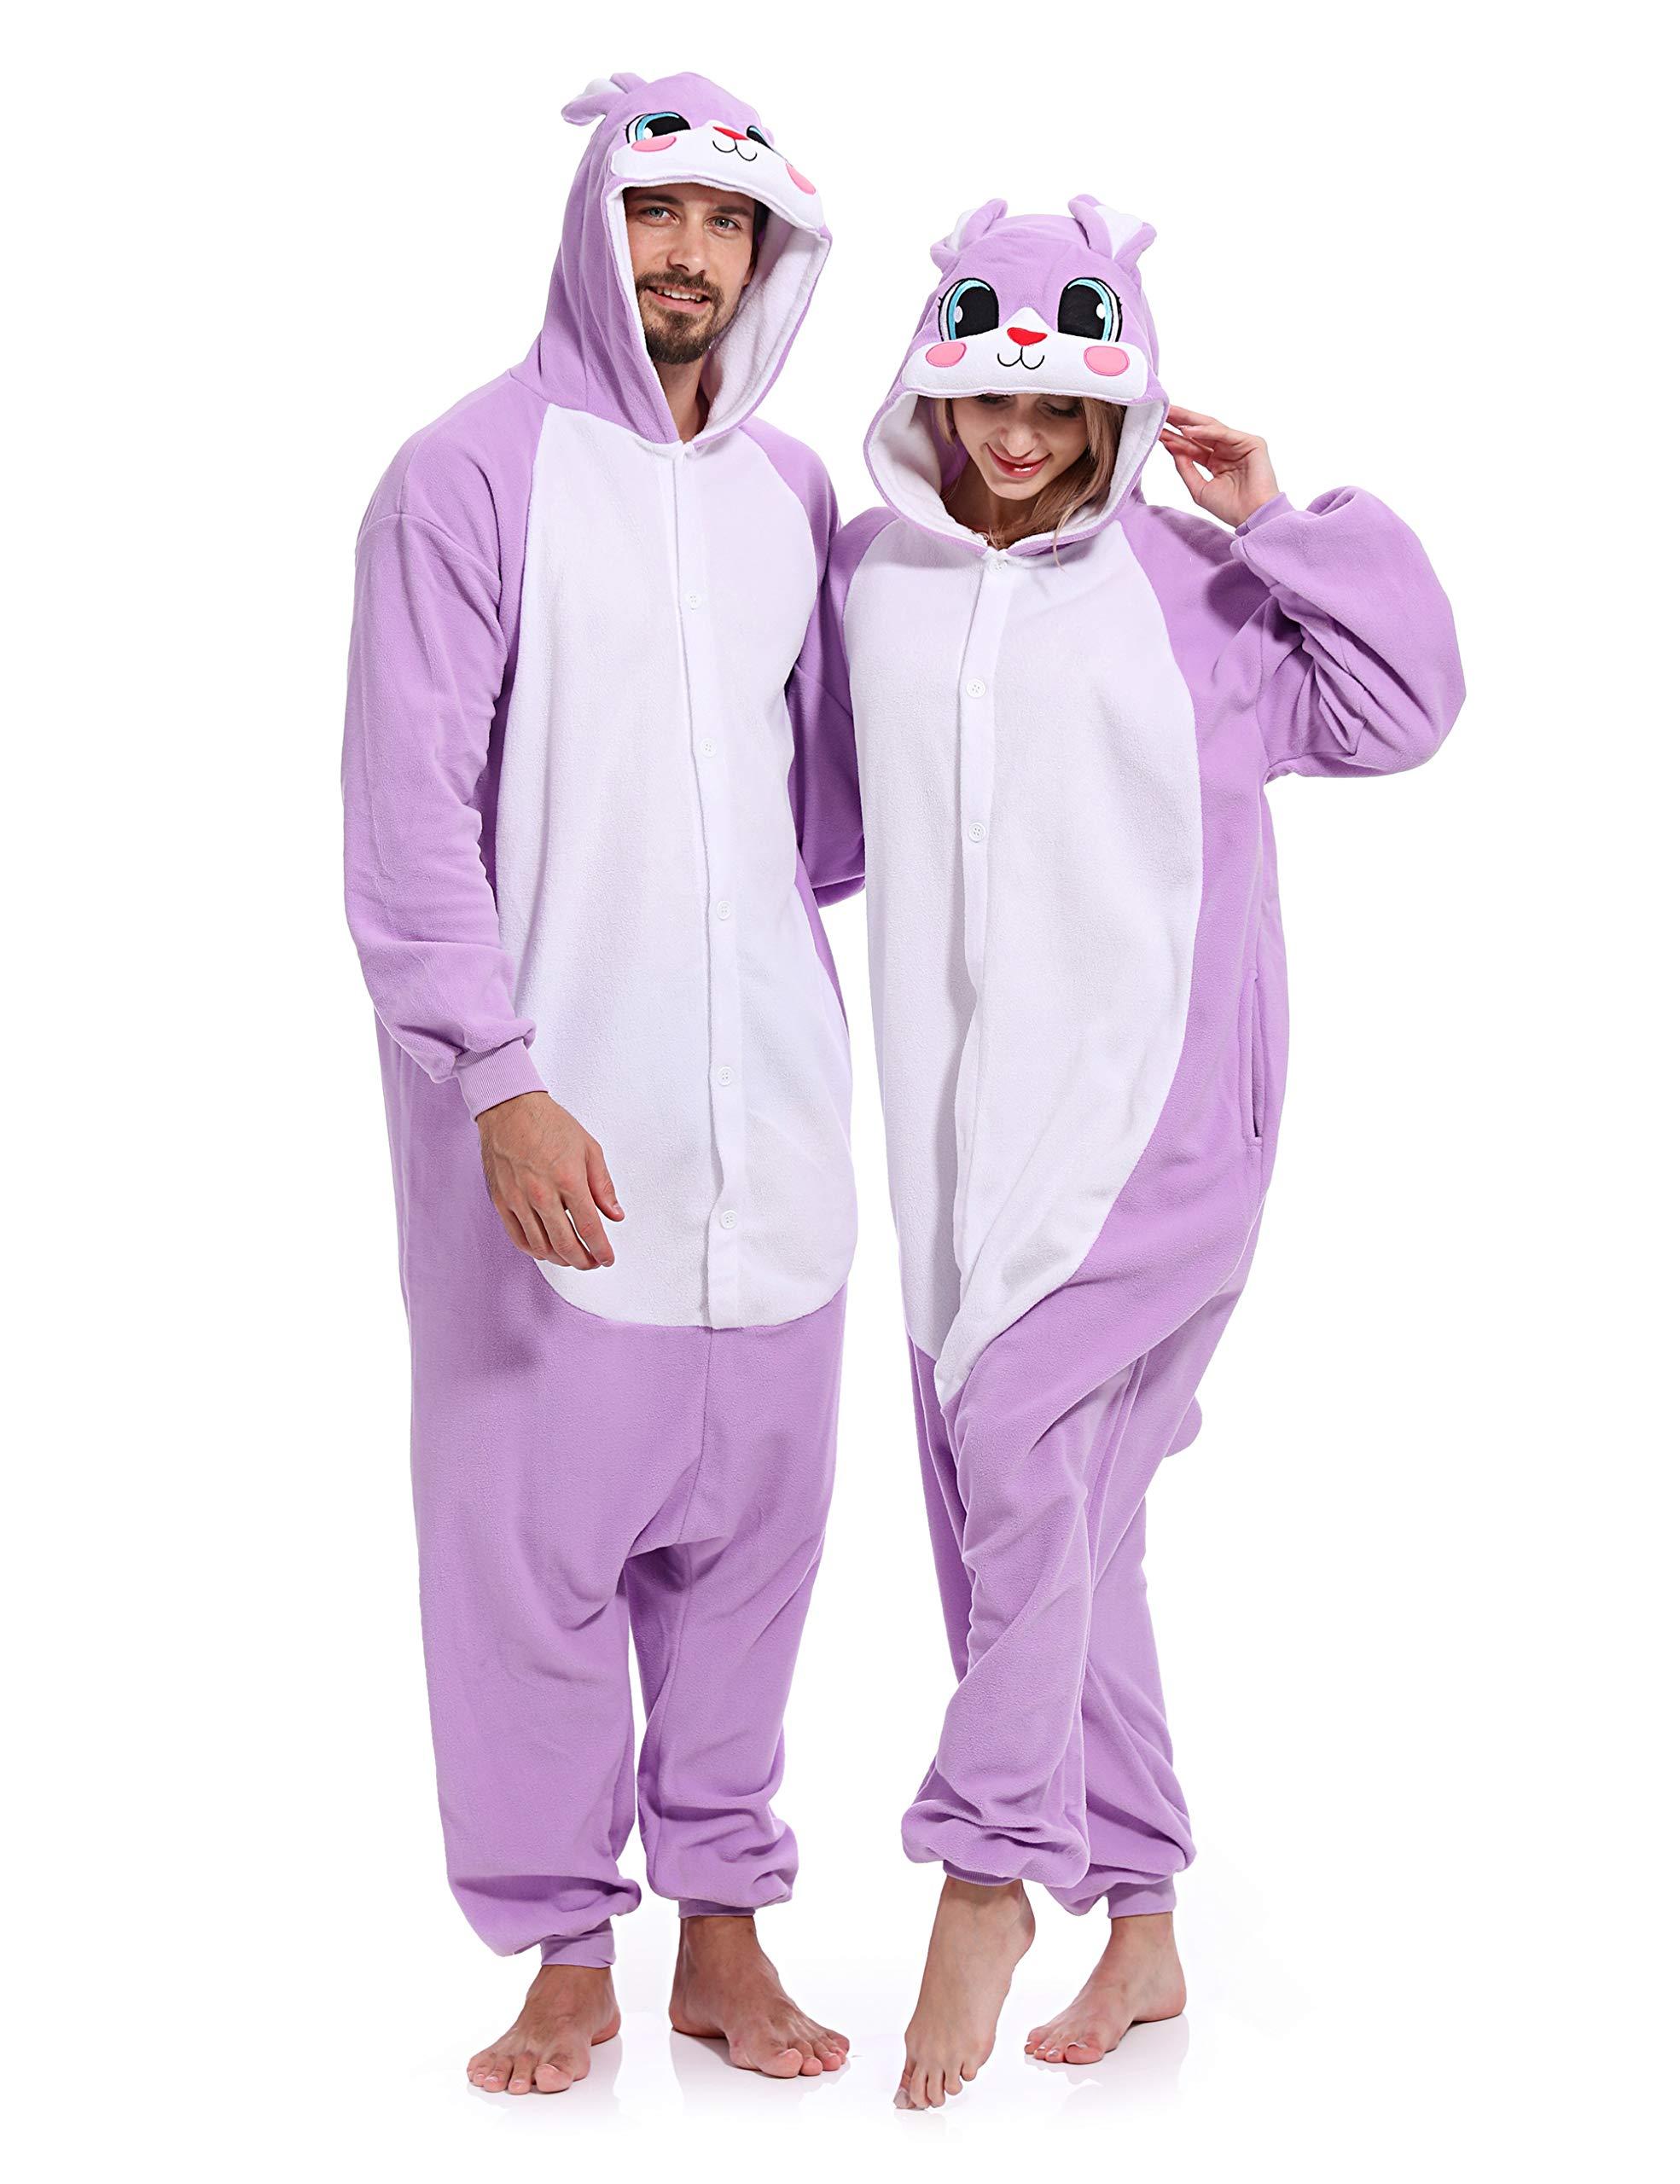 vavalad Adult Bunny Onesie Adult Unisex Pajamas Animal One Piece Cosplay Costume for Women Men